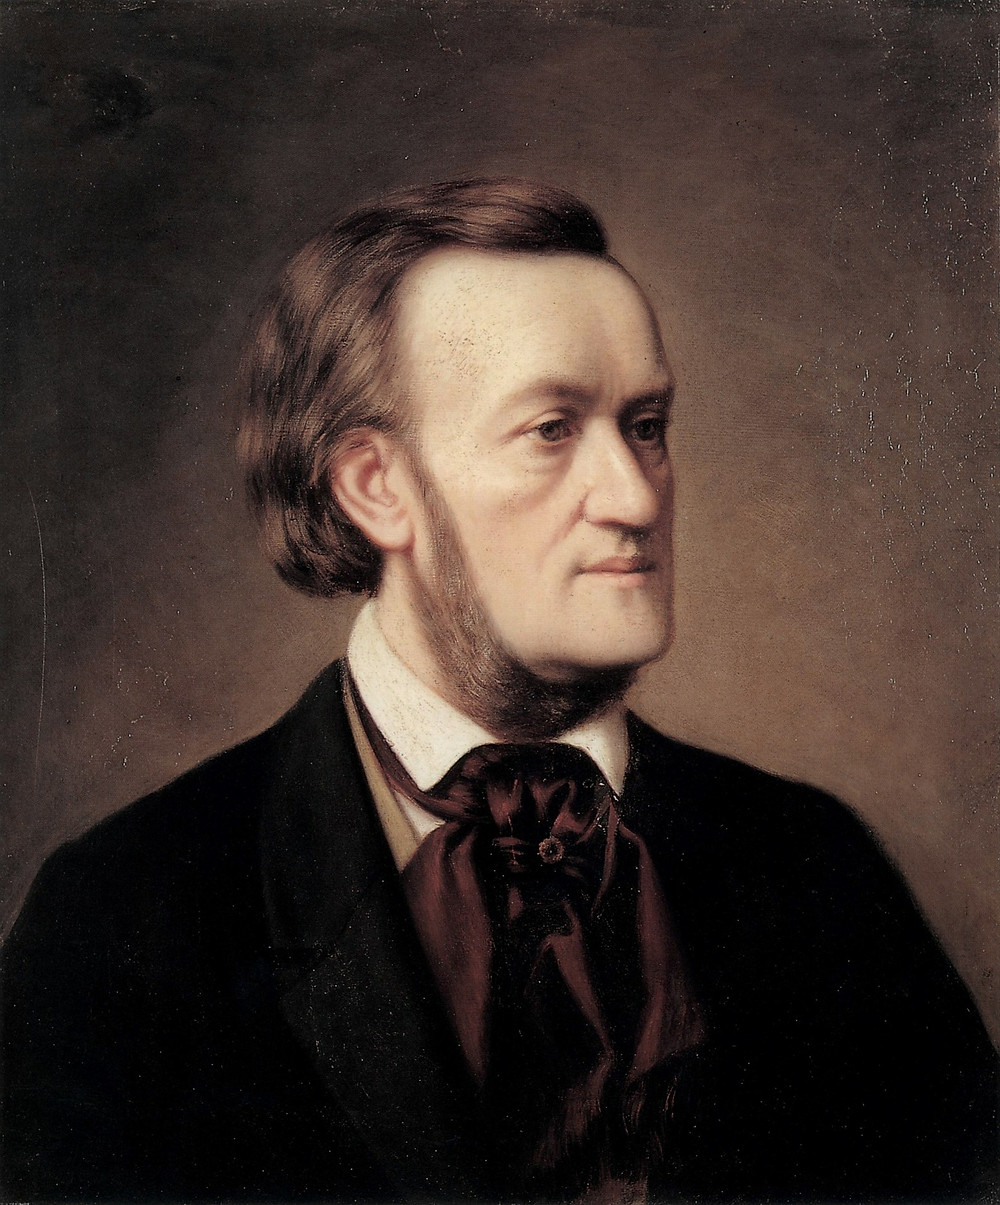 Perfil de Richard Wagner